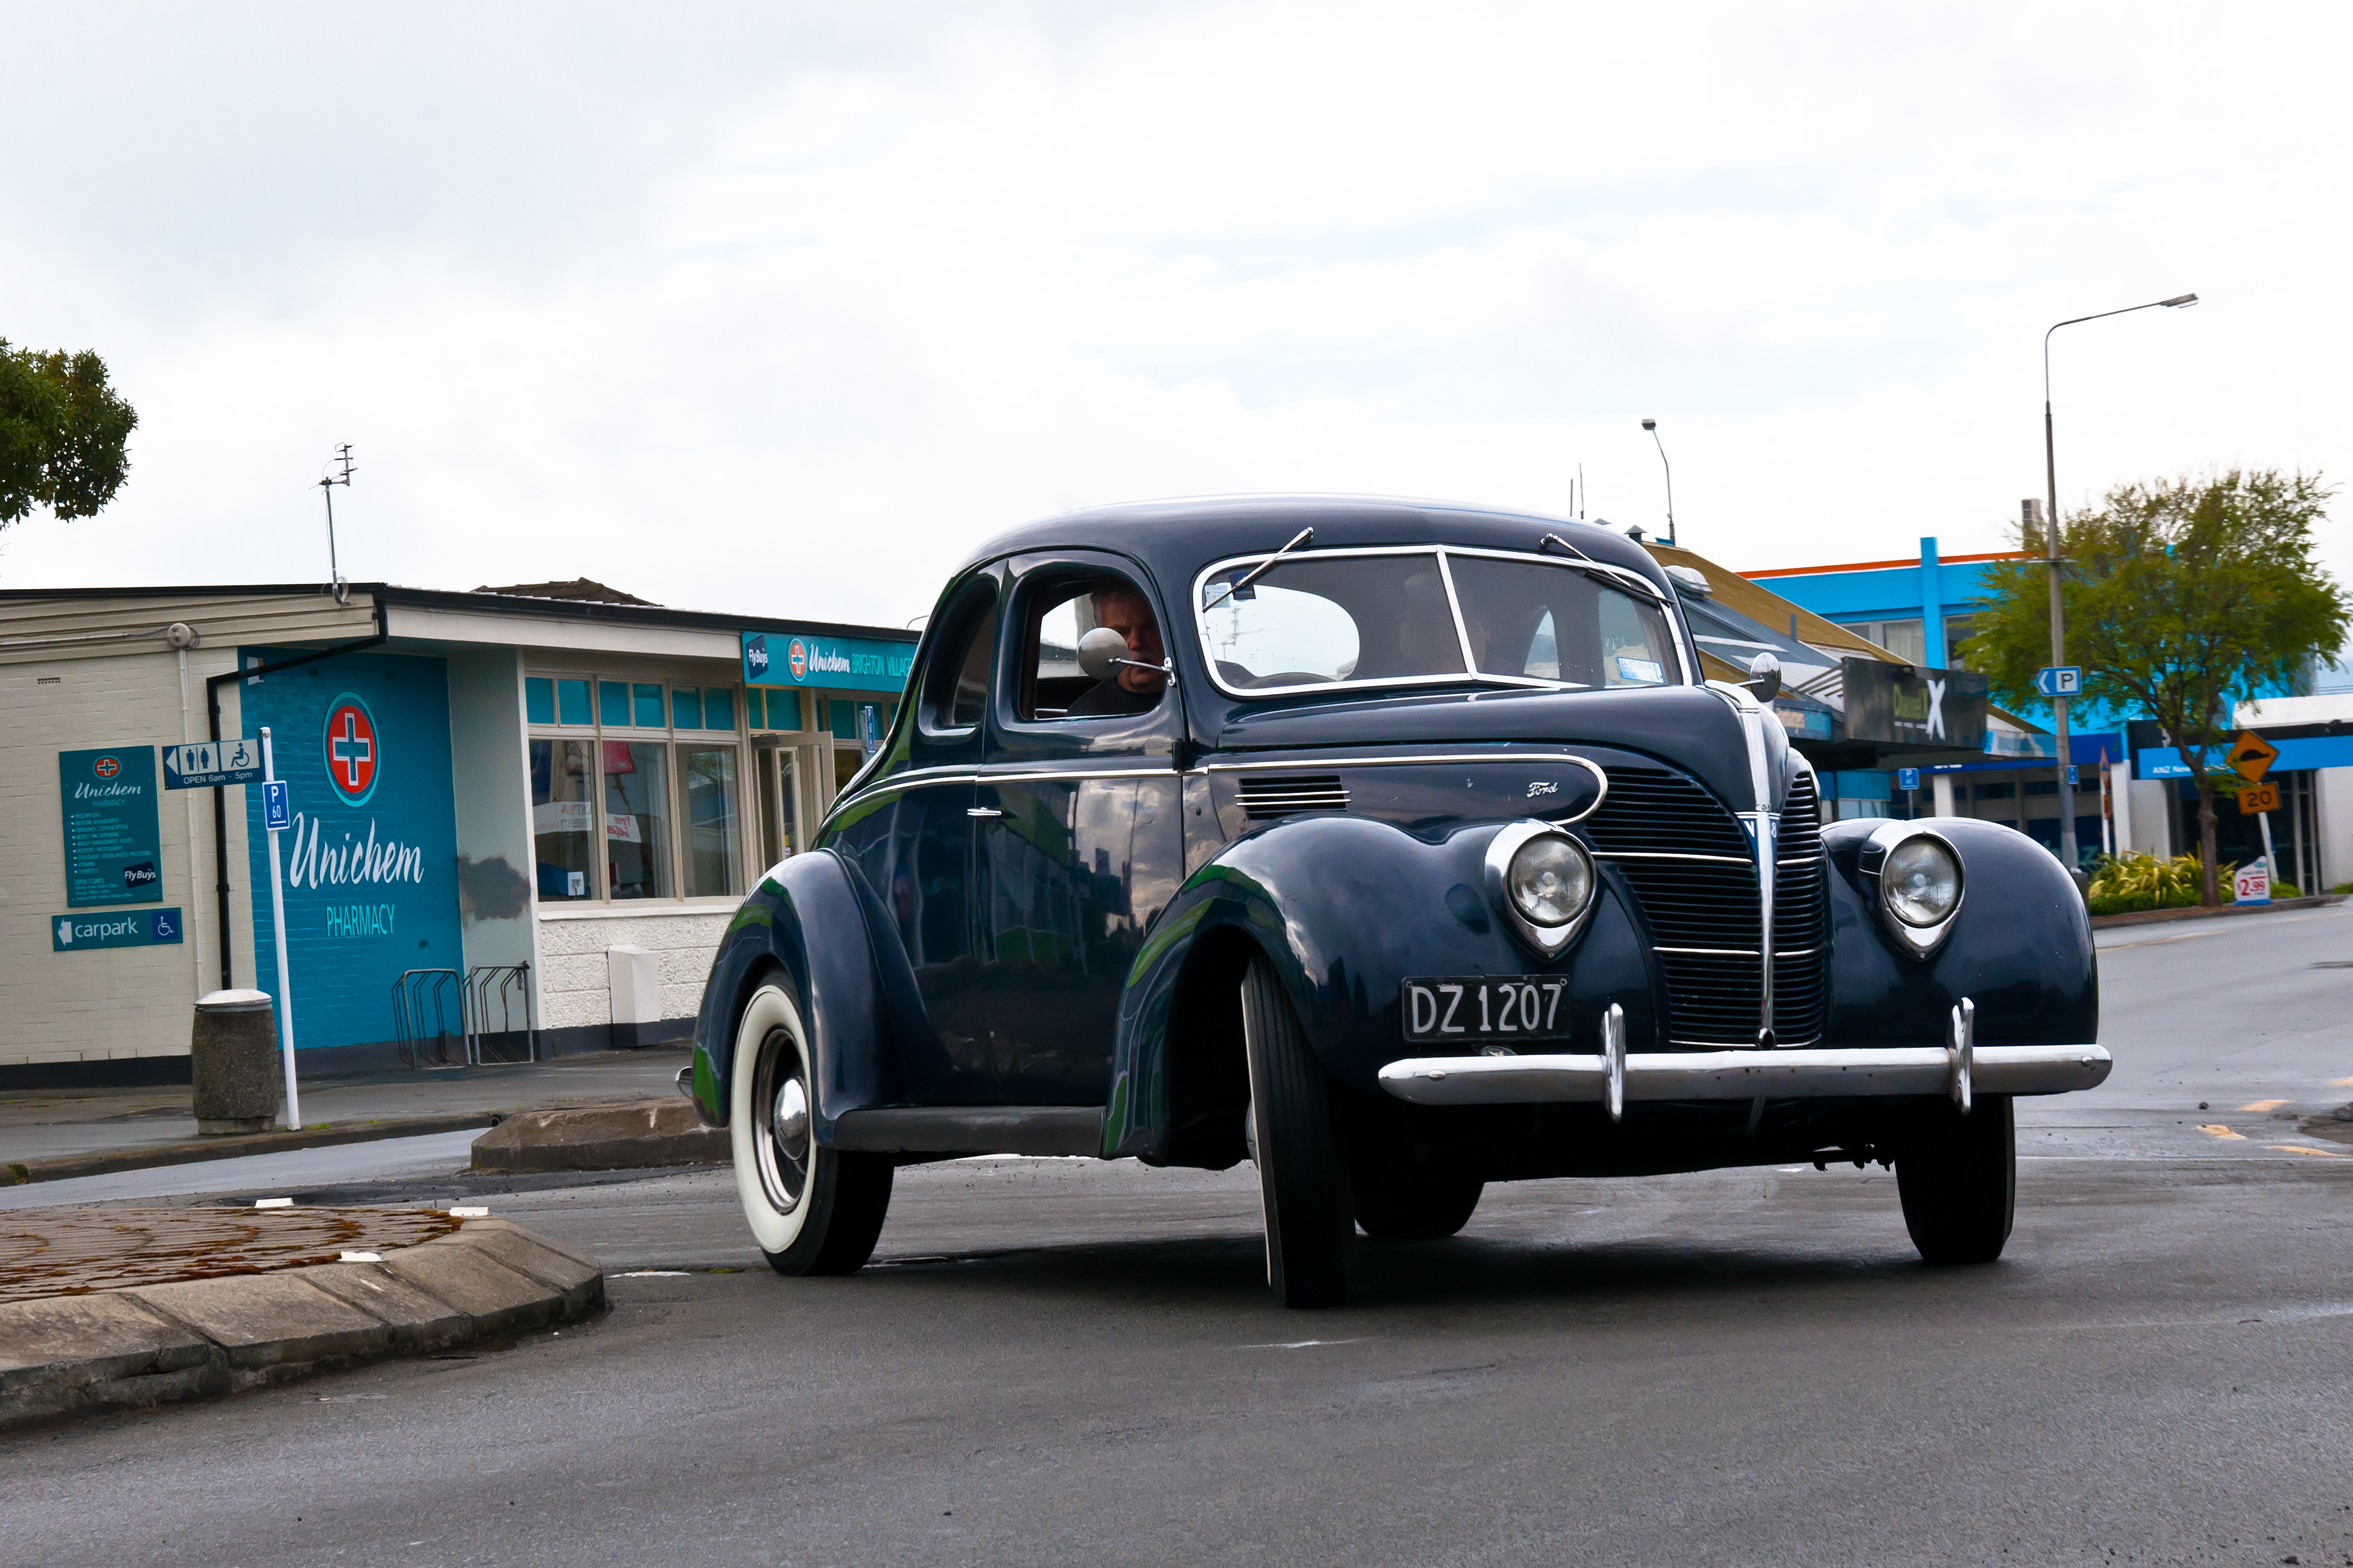 1939 FORD V8, 1939, Car, Ford, New Brighton, HQ Photo